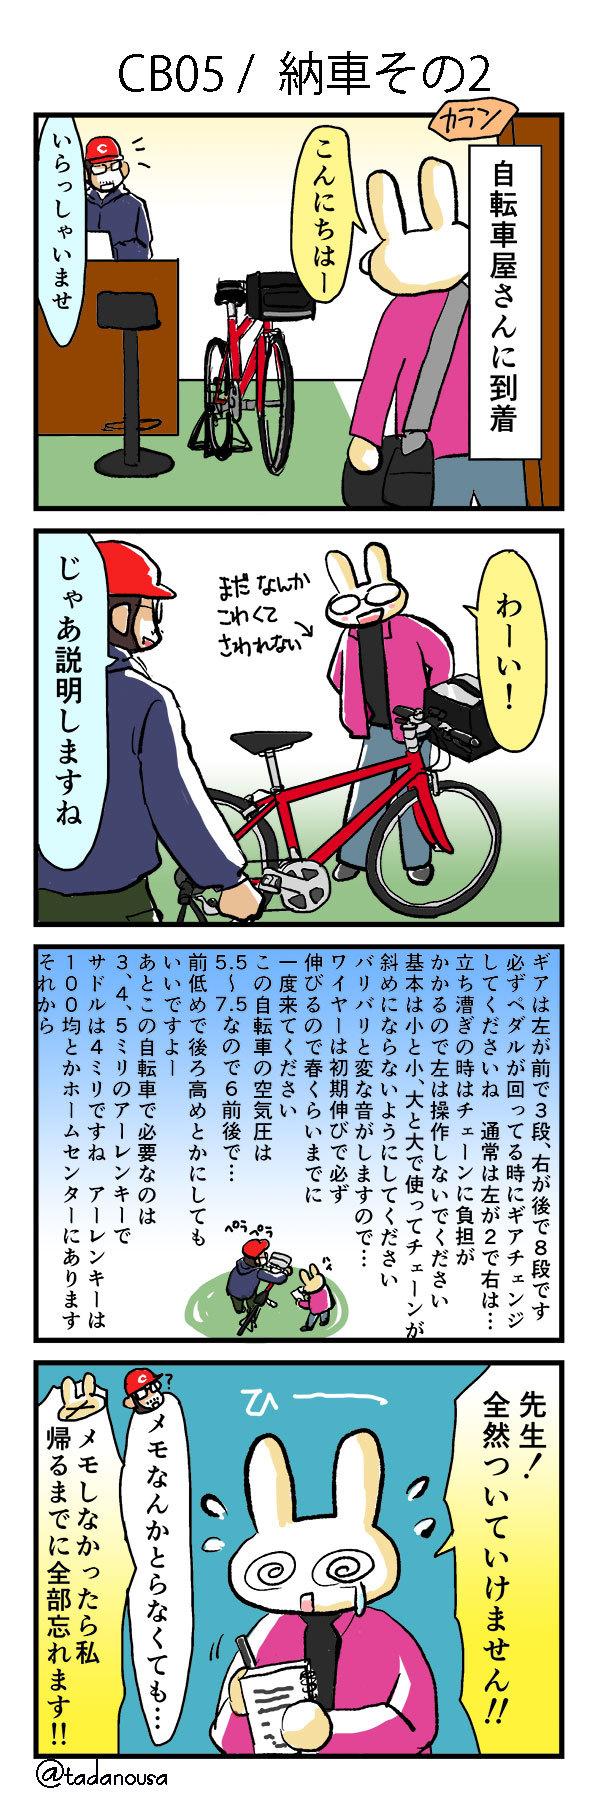 bike_4koma_kako045_s.jpg